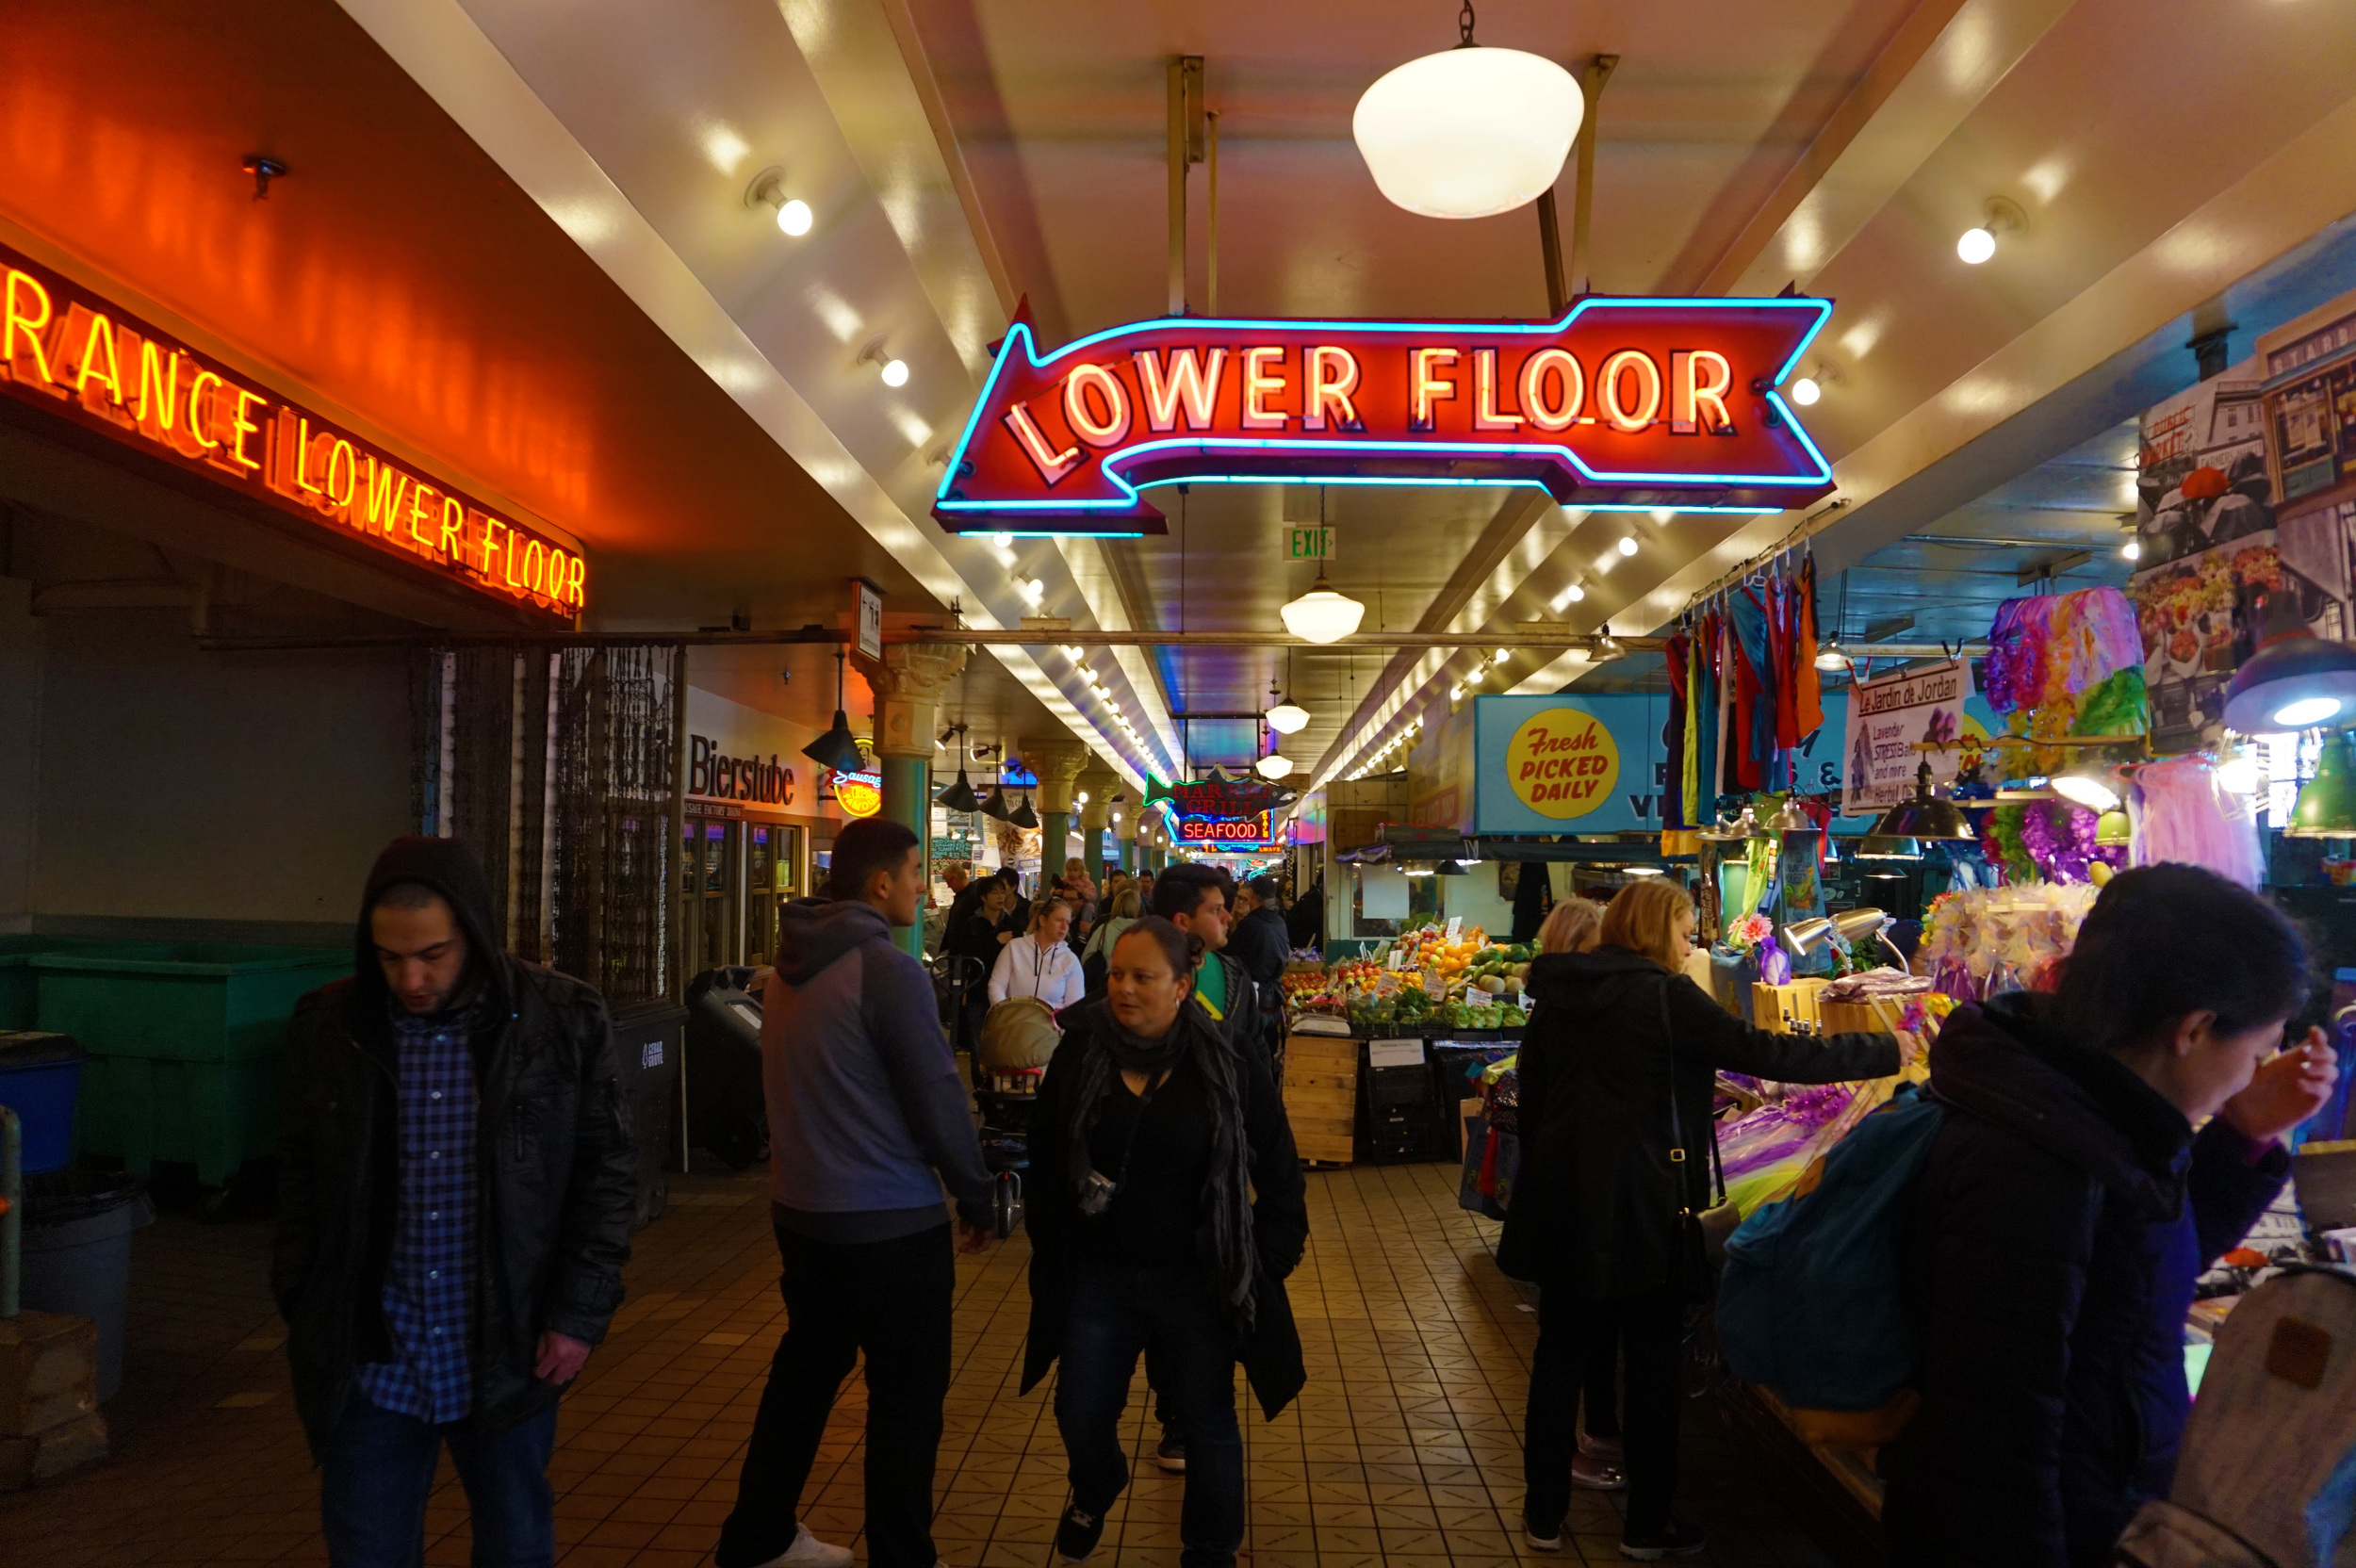 It was kind of like an indoor boardwalk or bazaar